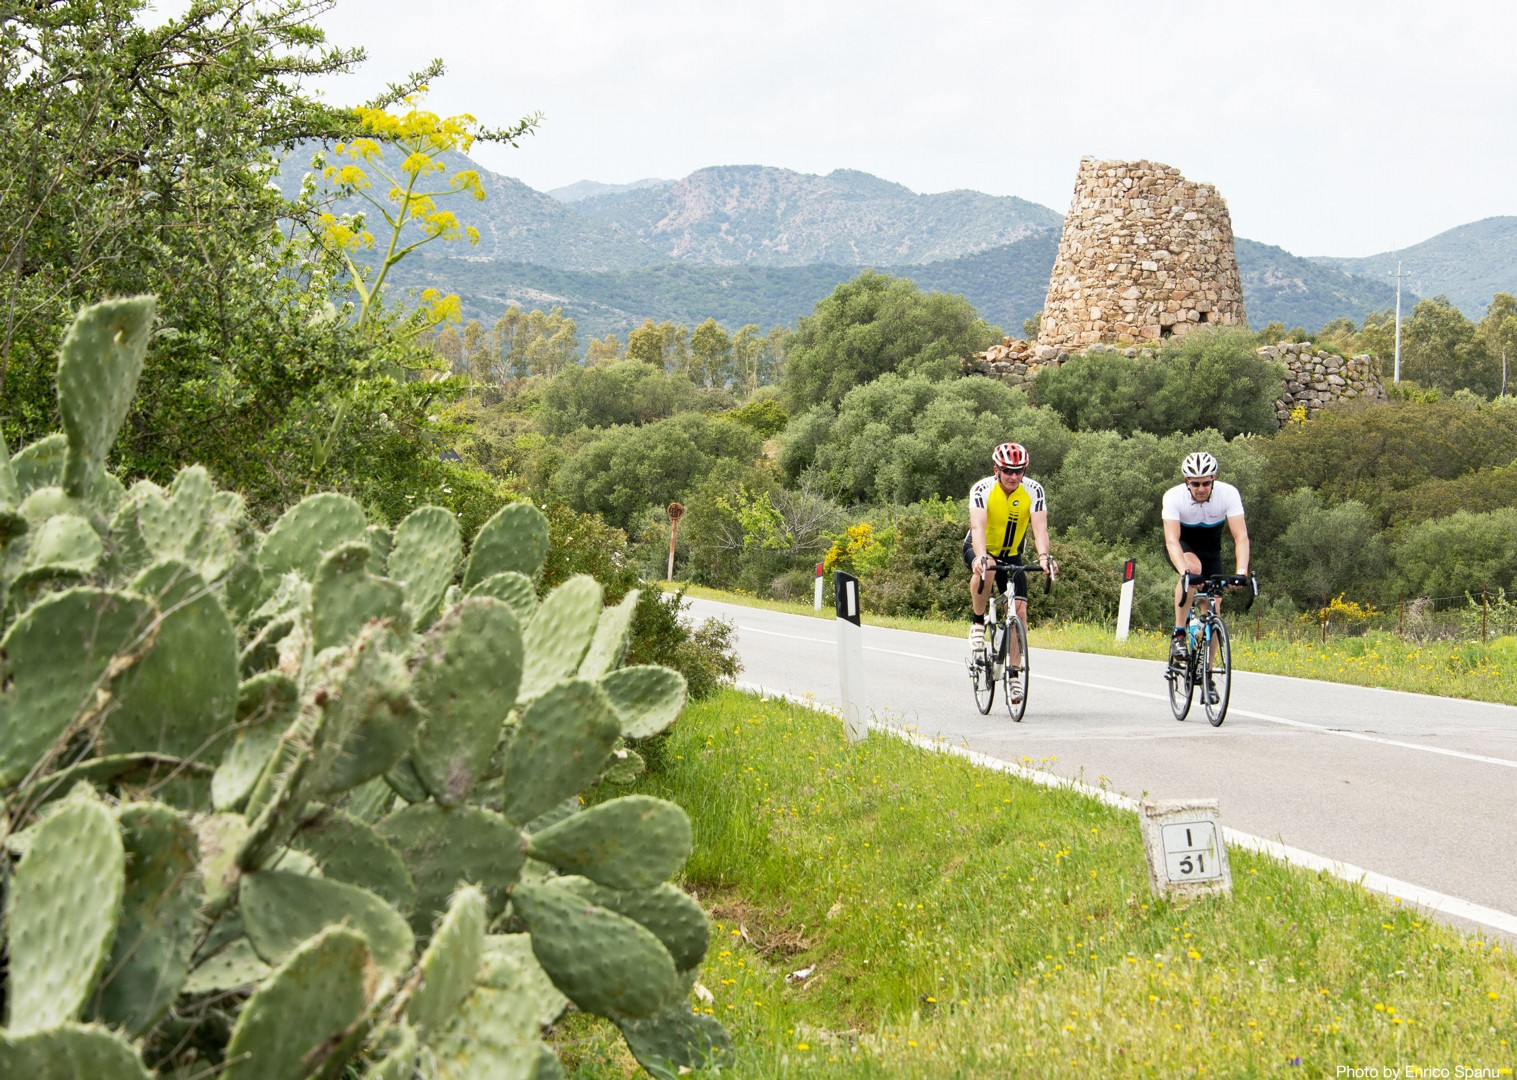 Sardinian-Cycling-Holiday-Road-Sardinian-Mountains.jpg - Italy - Sardinia - Sardinian Mountains - Guided Road Cycling Holiday - Italia Road Cycling